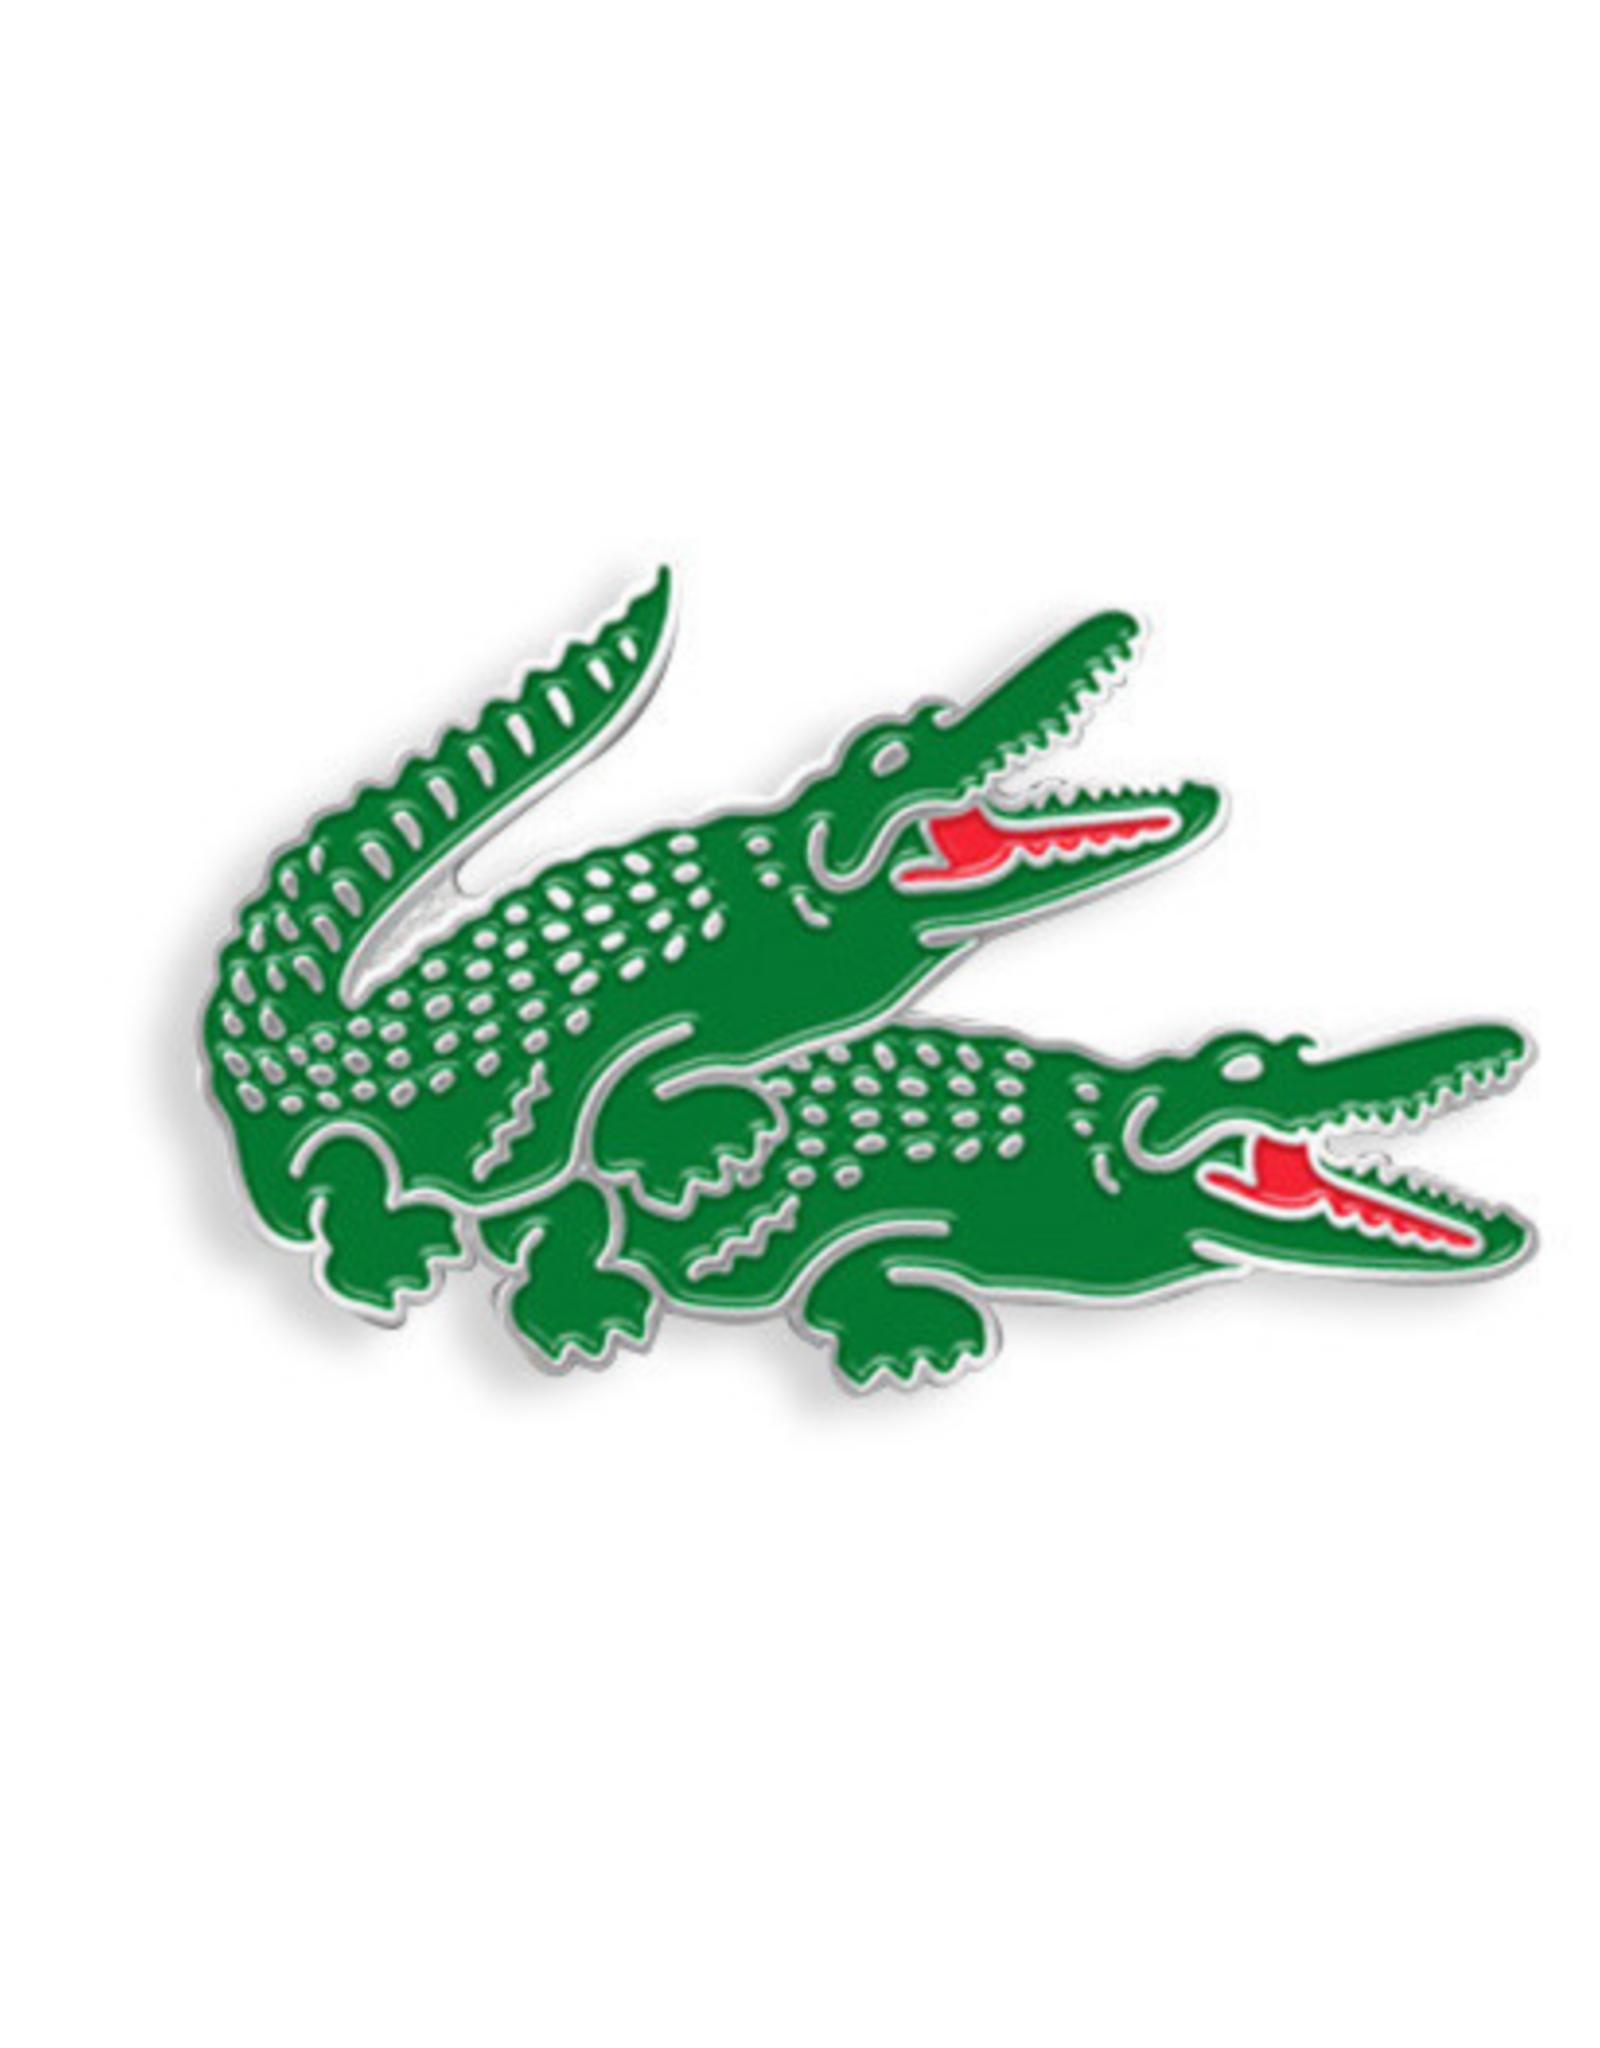 Allimater Alligators Enamel Pin